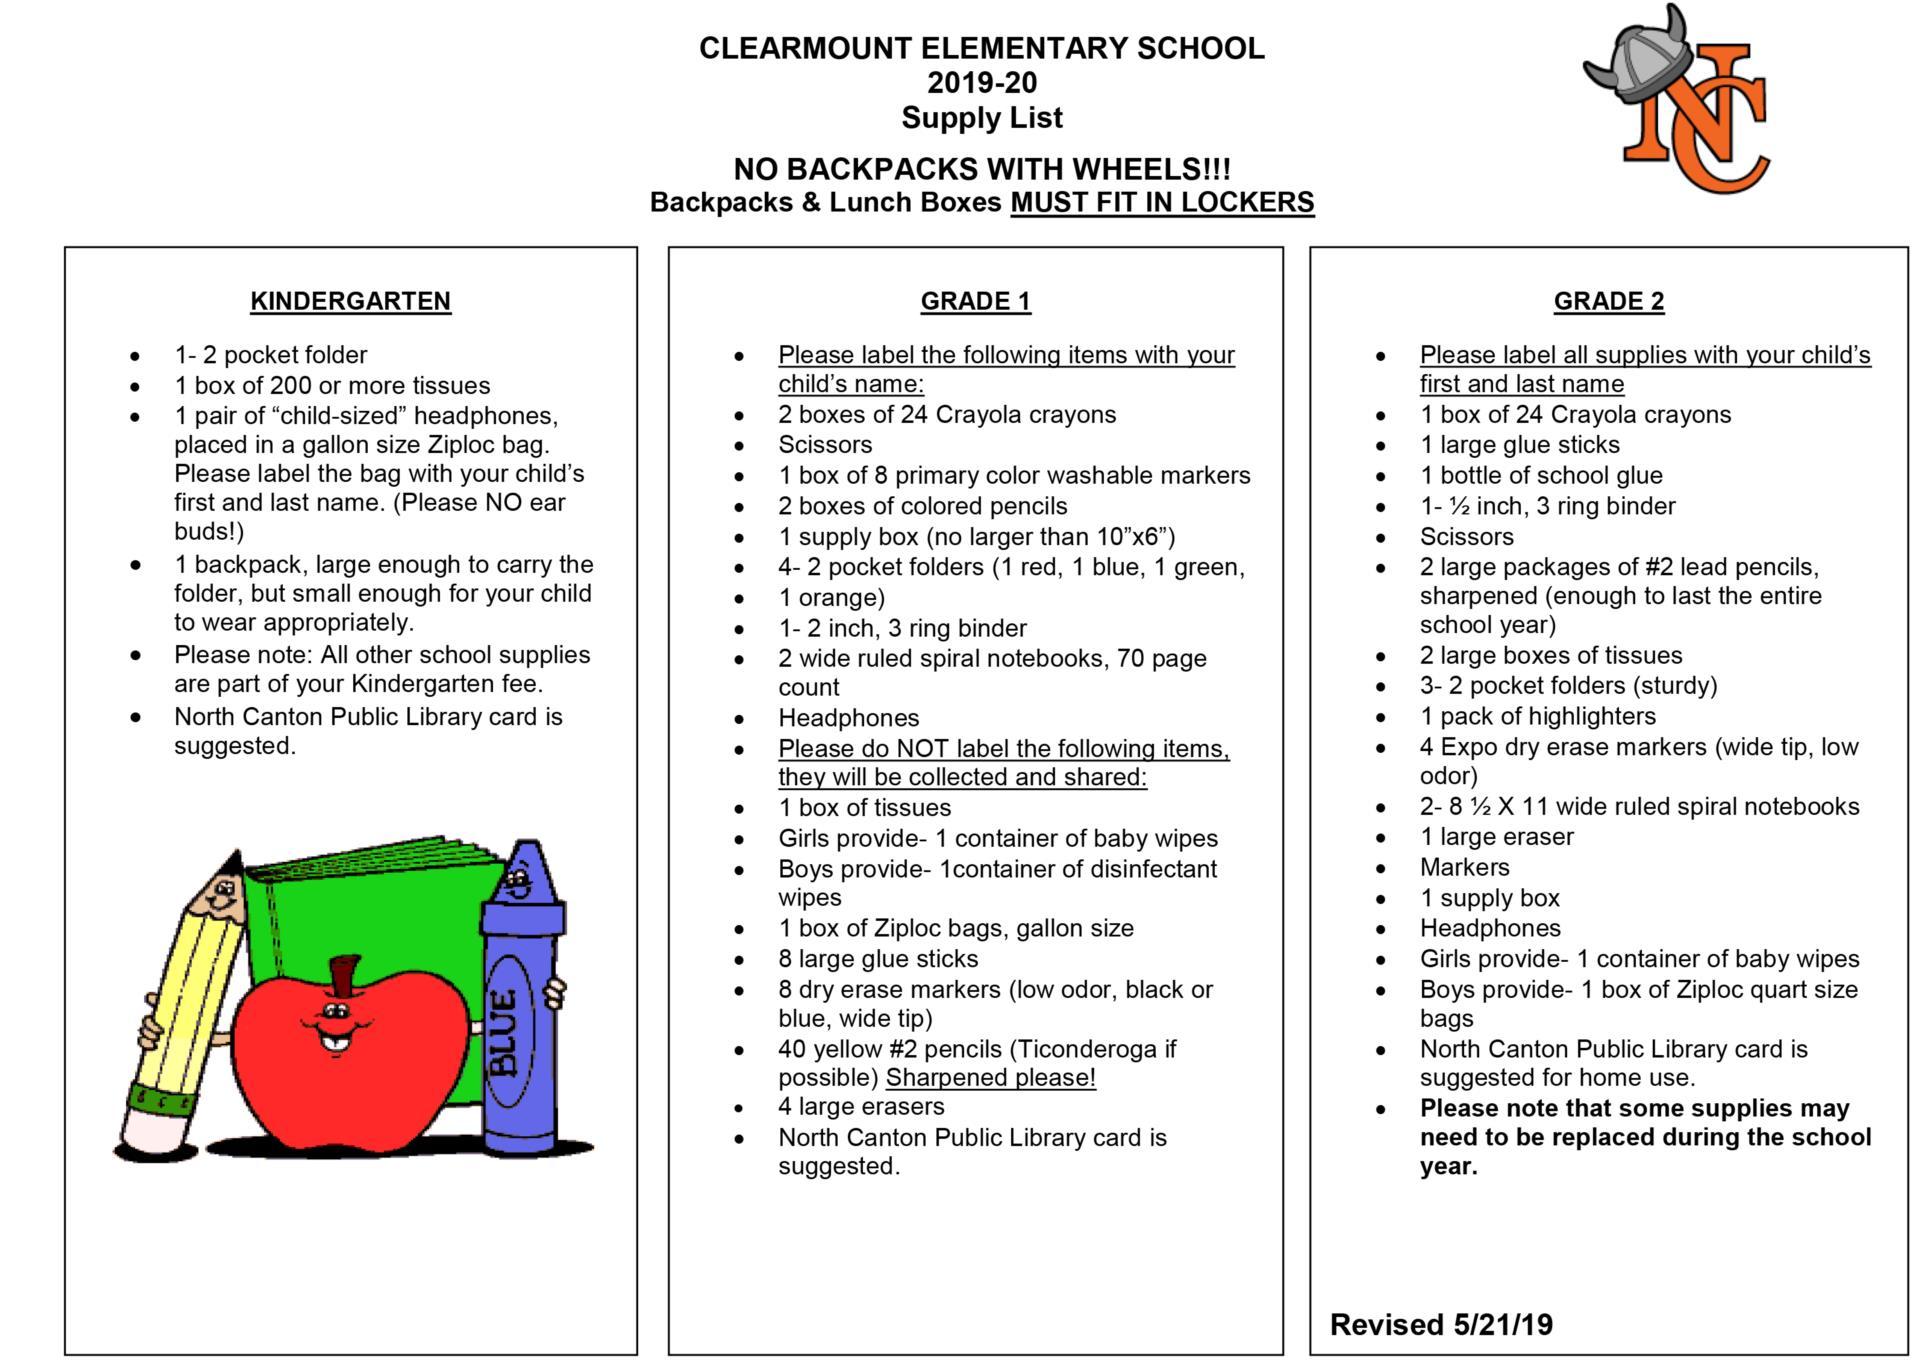 supply list for grades k-2